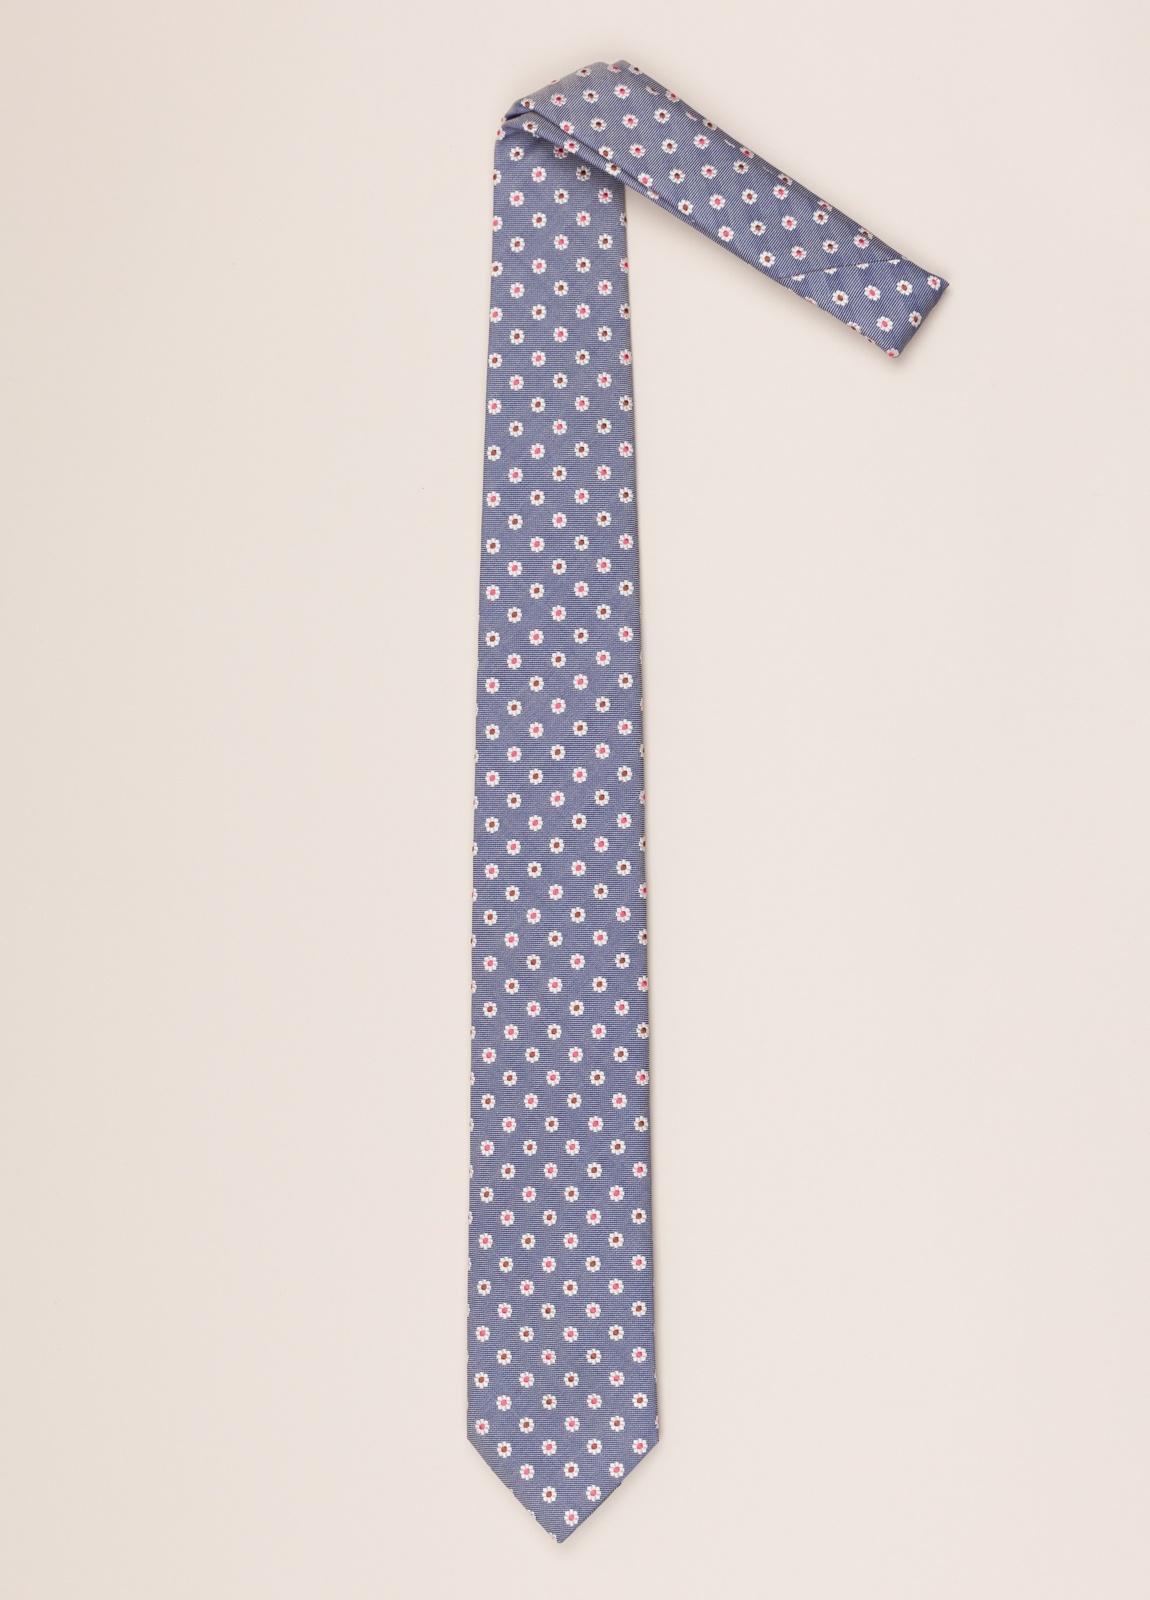 Corbata FUREST COLECCIÓN dibujo azul - Ítem1